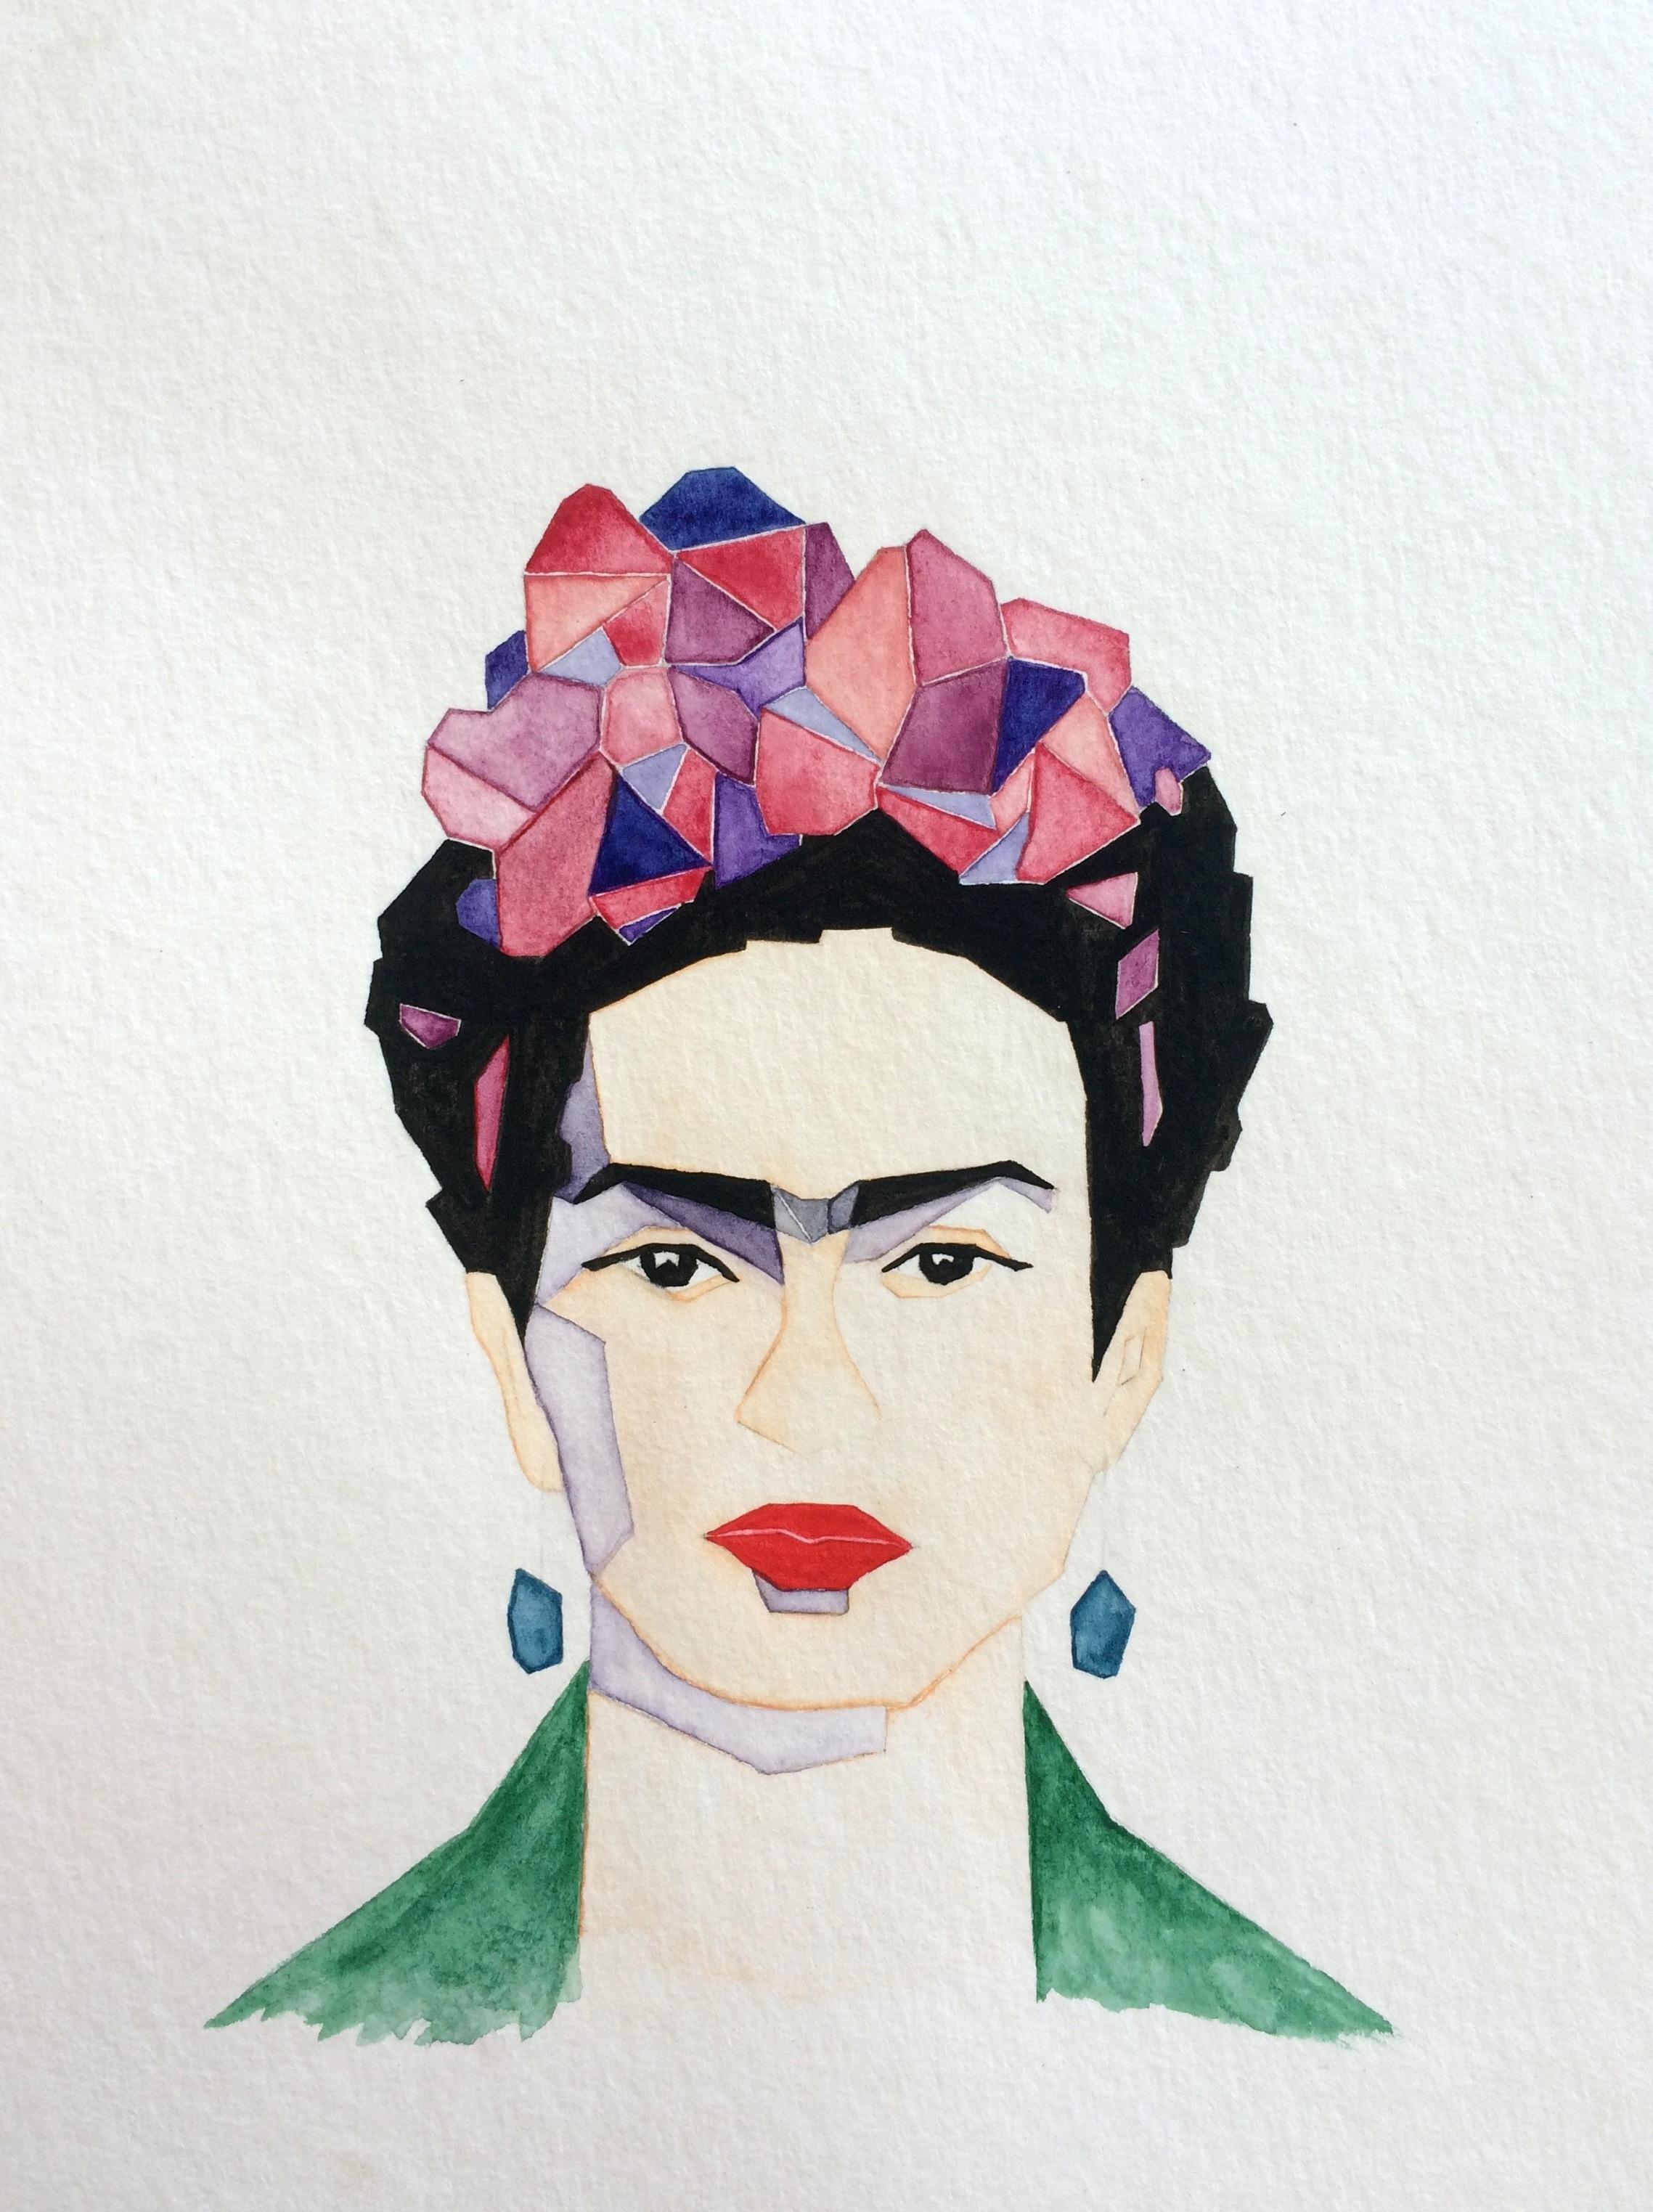 © Frida Kahlo II by Renée Nesbitt